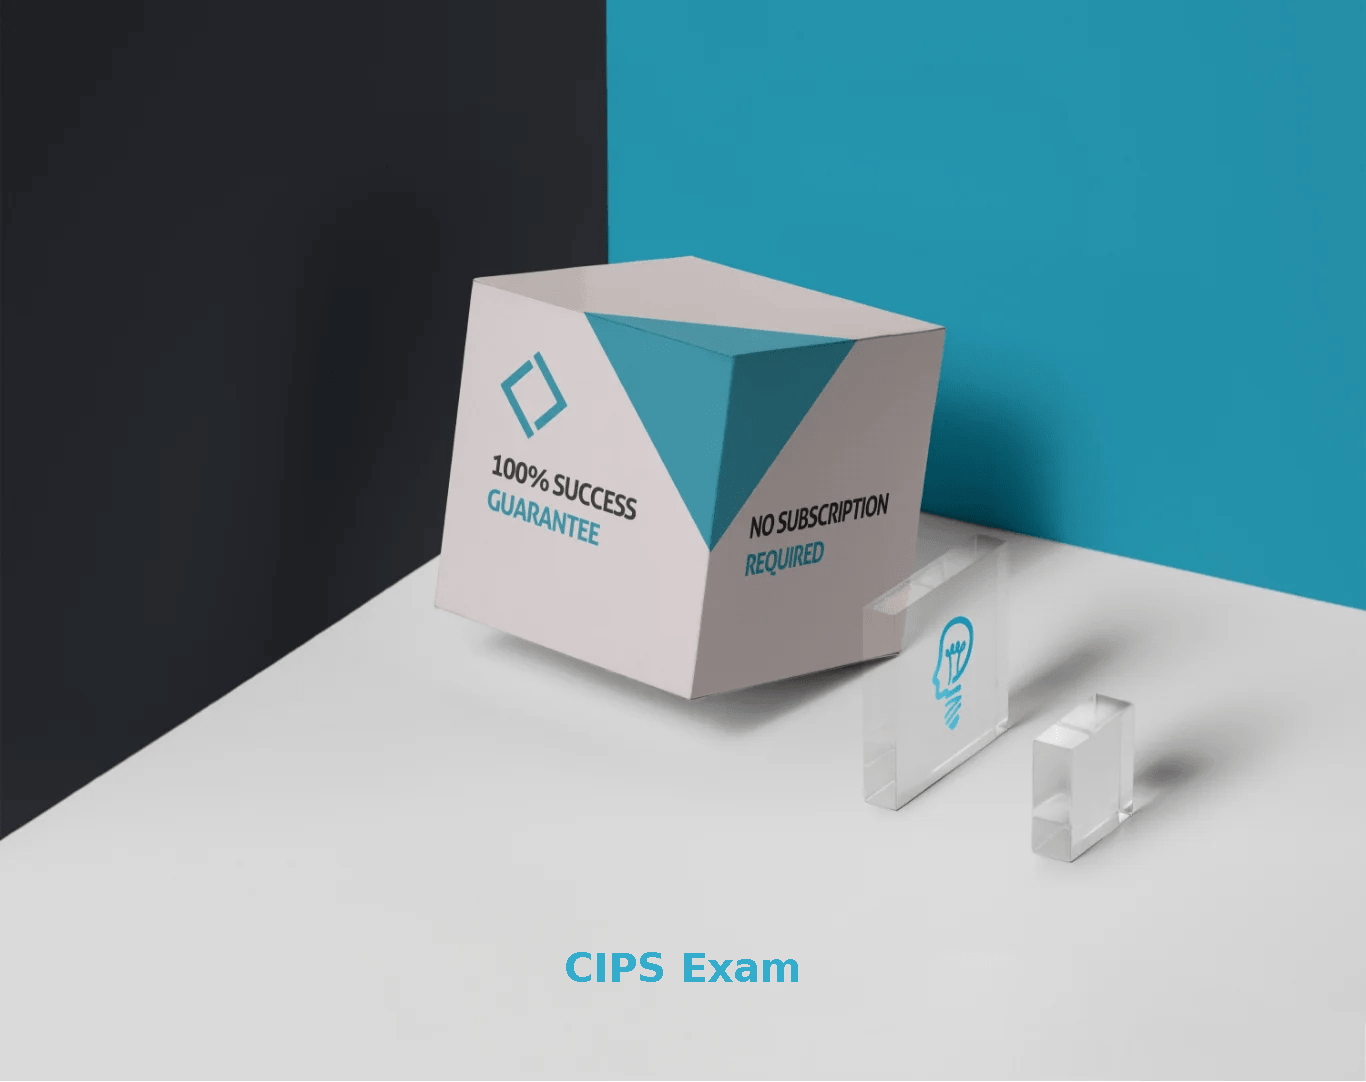 CIPS Exam Dumps